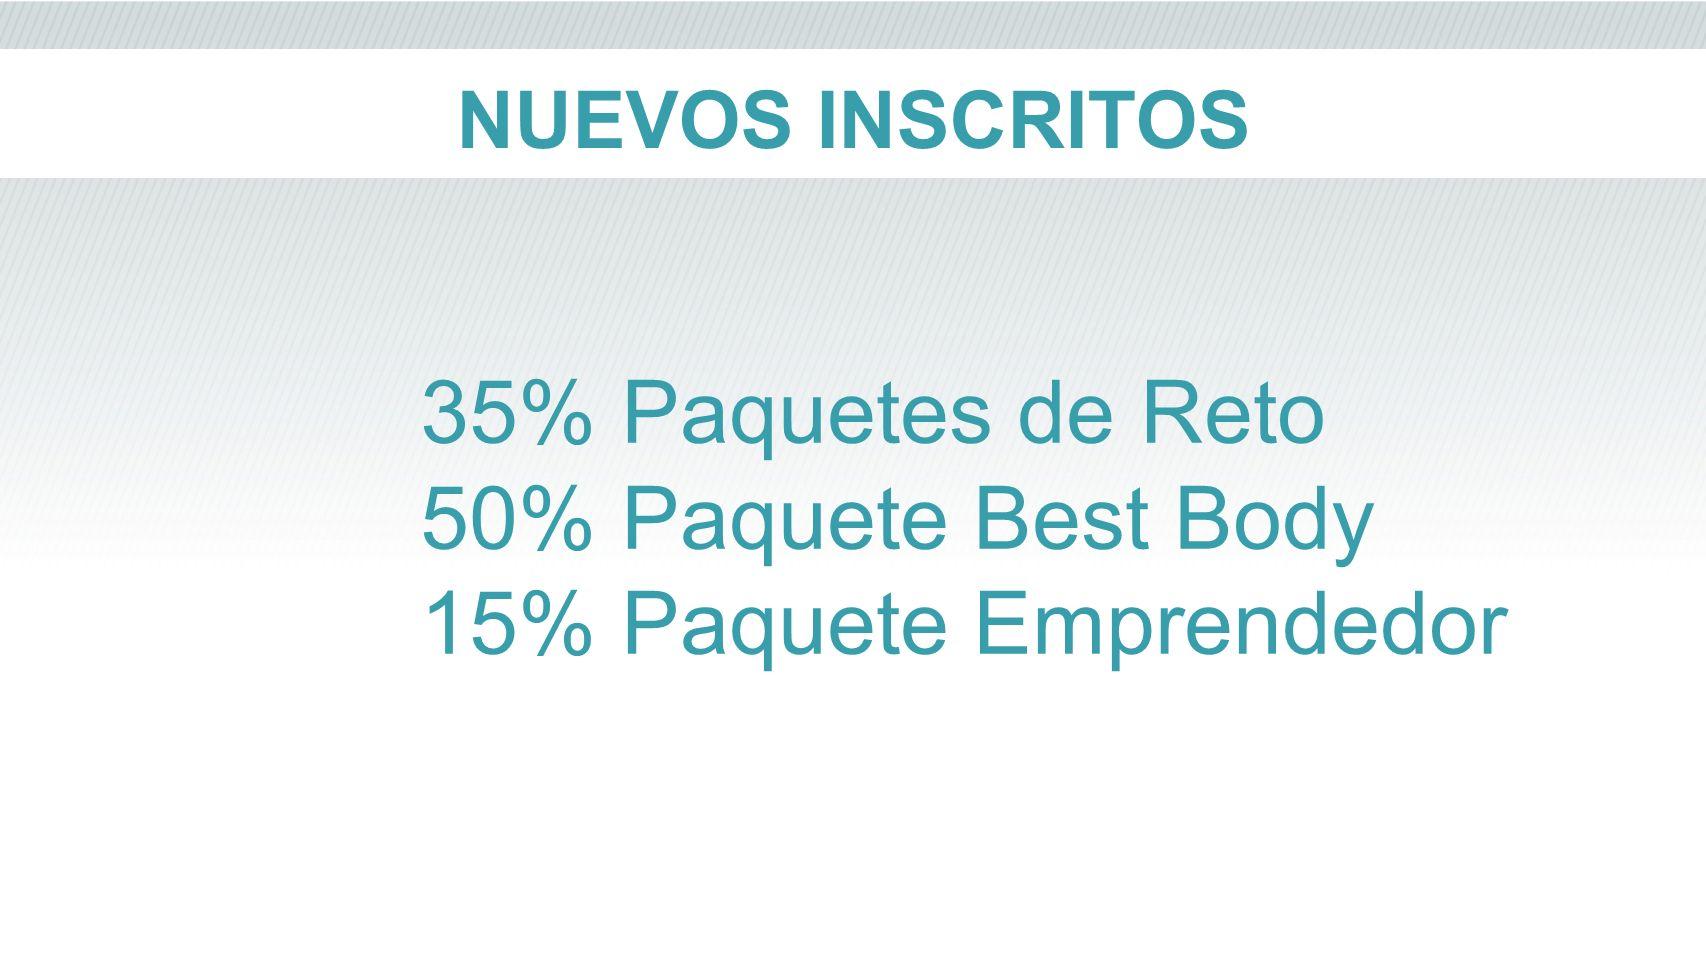 35% Paquetes de Reto 50% Paquete Best Body 15% Paquete Emprendedor